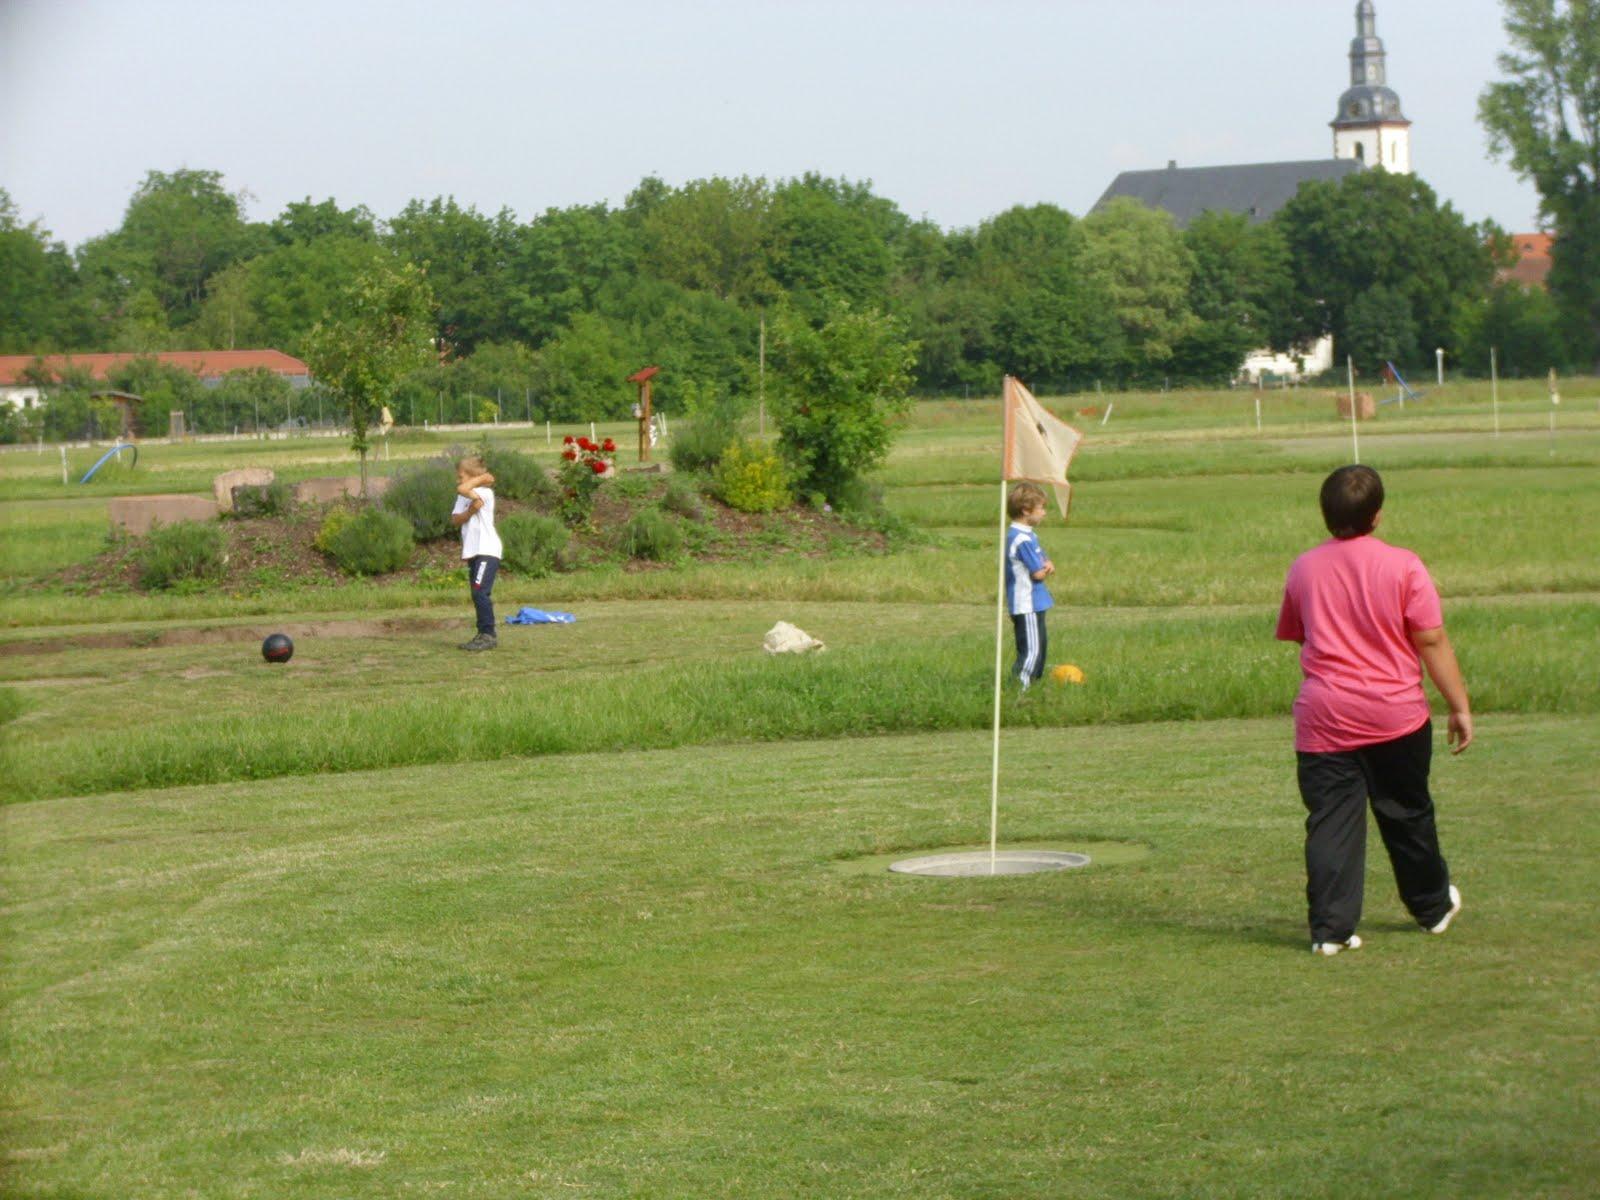 Badenia Jugend Hirschacker Fussball Golf Und Beachsoccer In